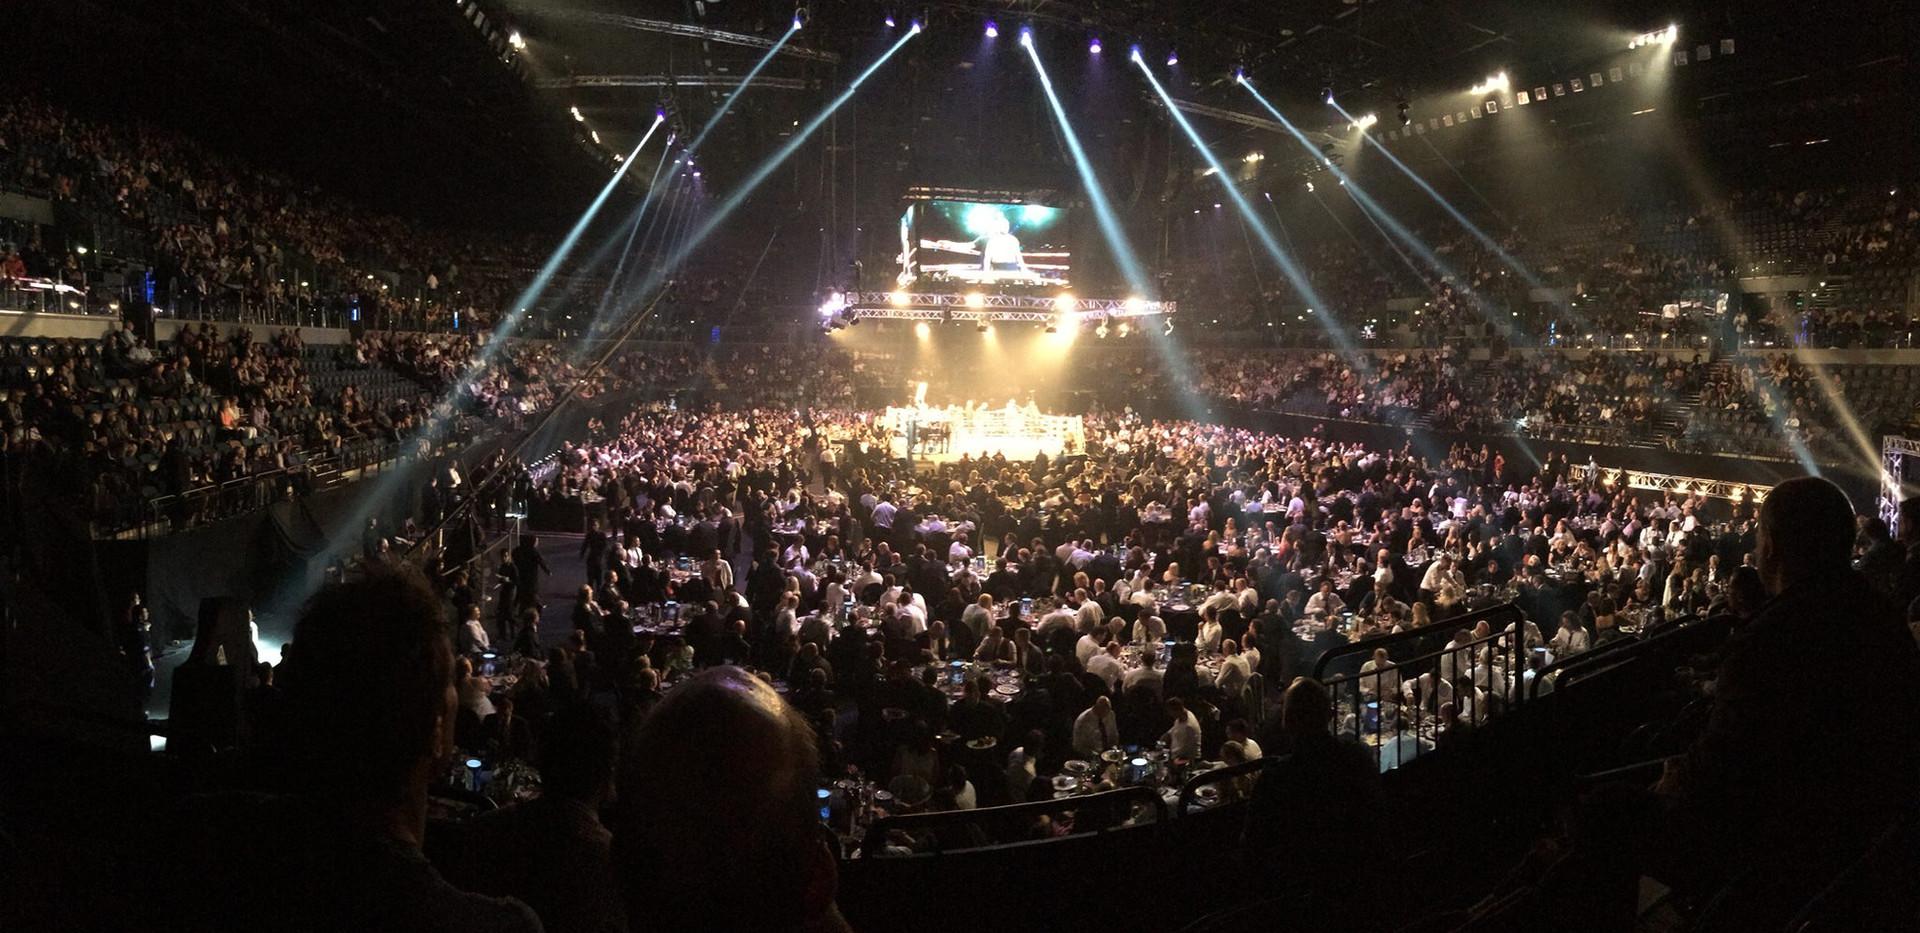 God Defend New Zealand - Parker v Ruiz WBO World Heavyweight Championship Title Fight